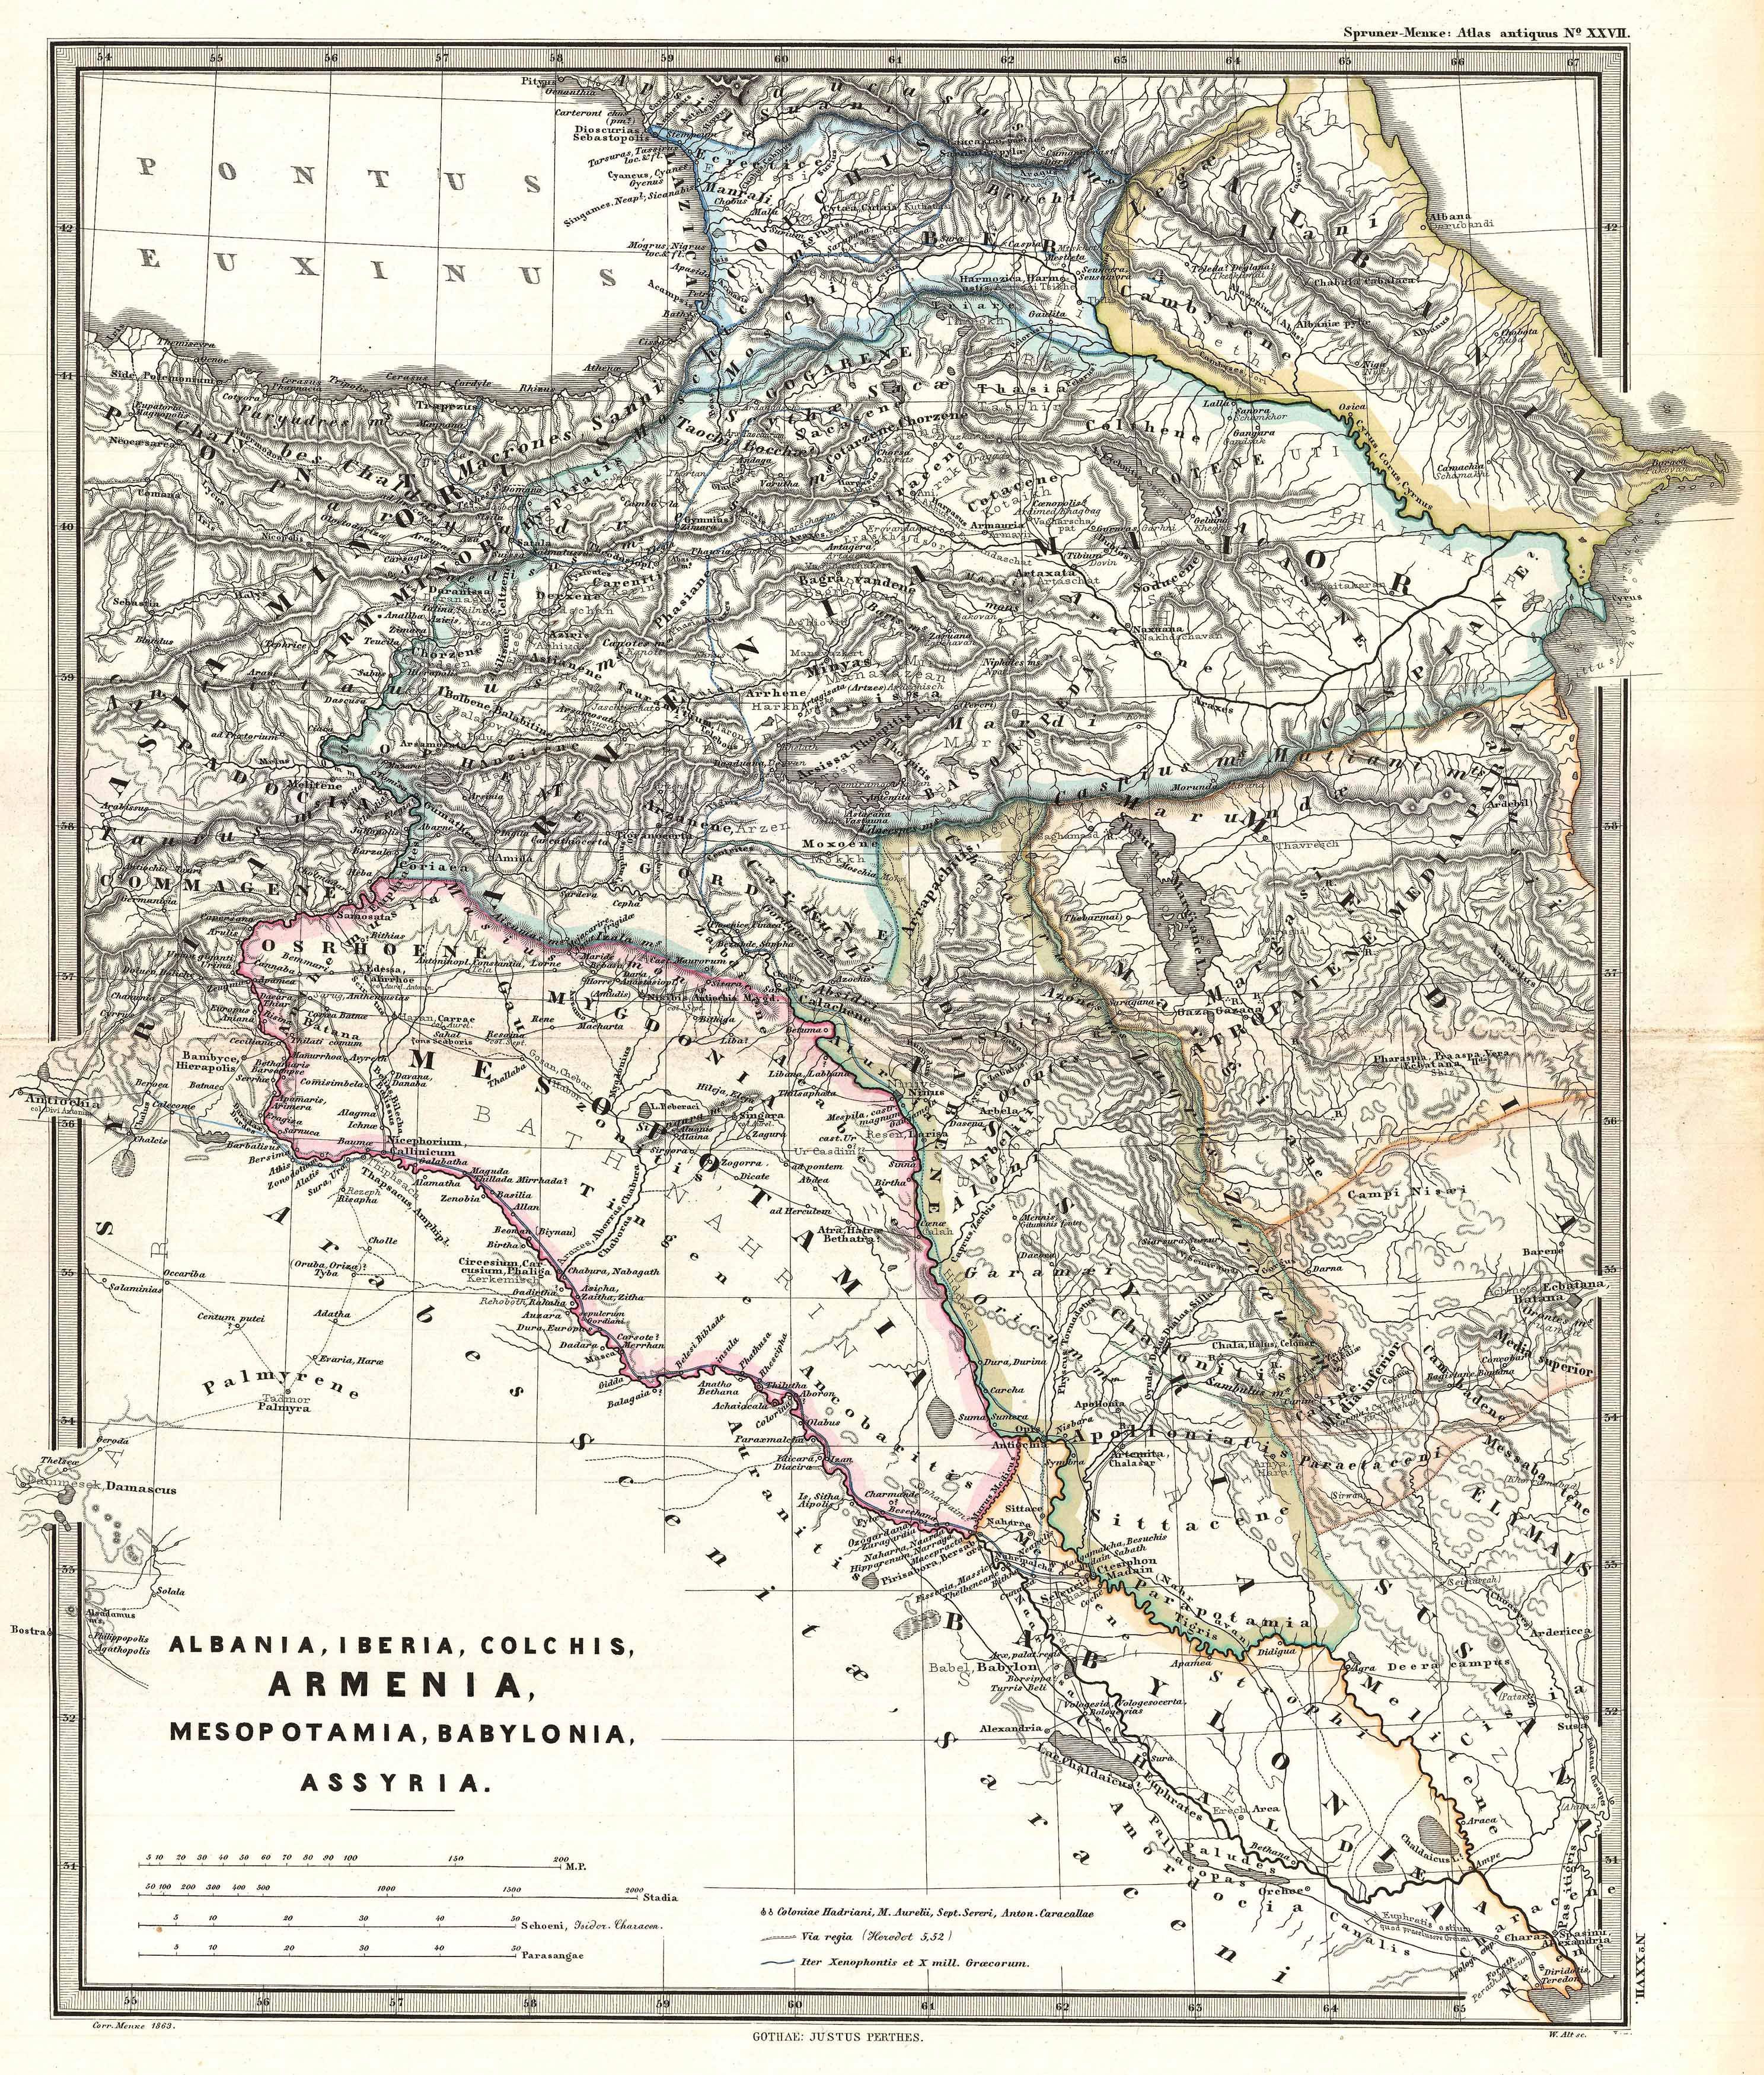 1965_Spruner_Map_of_the_Caucasus_and_Ira